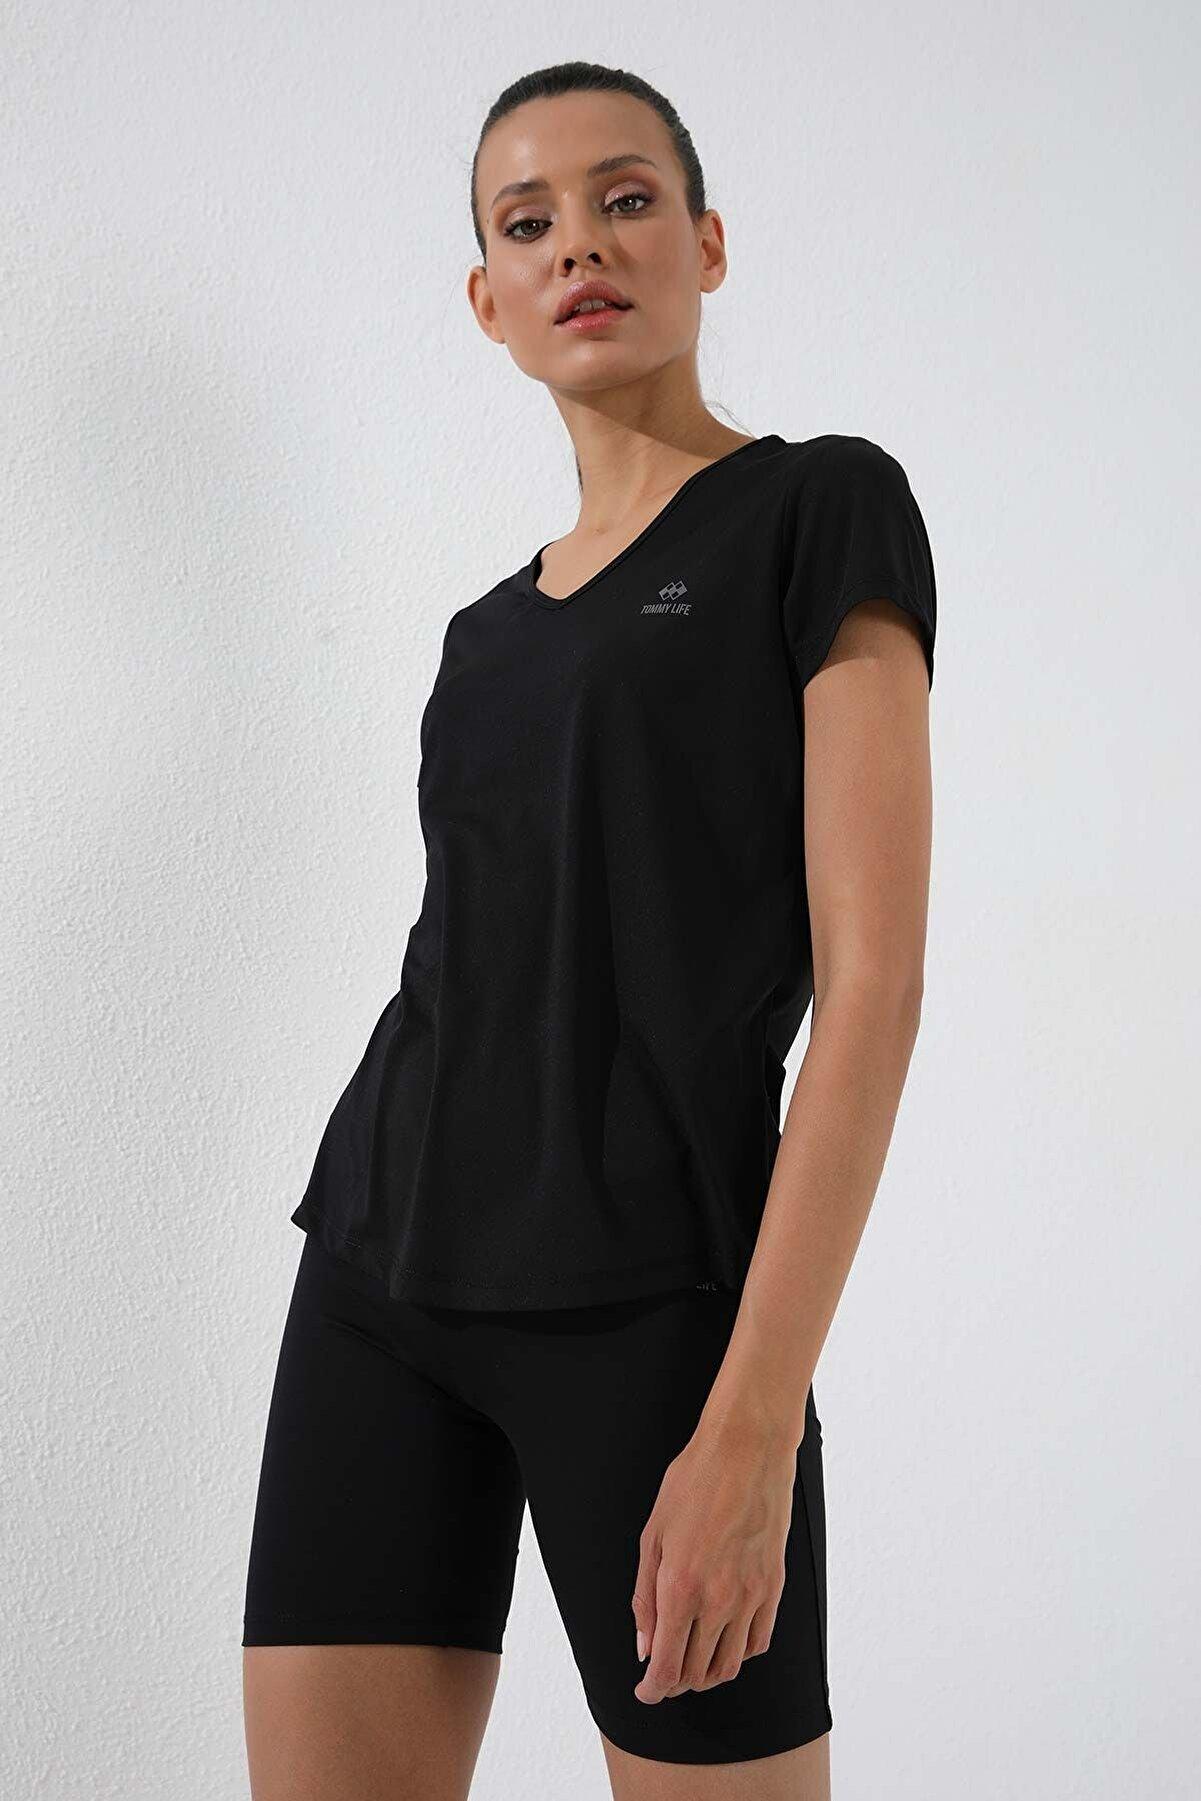 Tommy Life Siyah Kadın Basic Kısa Kol Standart Kalıp V Yaka T-shirt - 97145